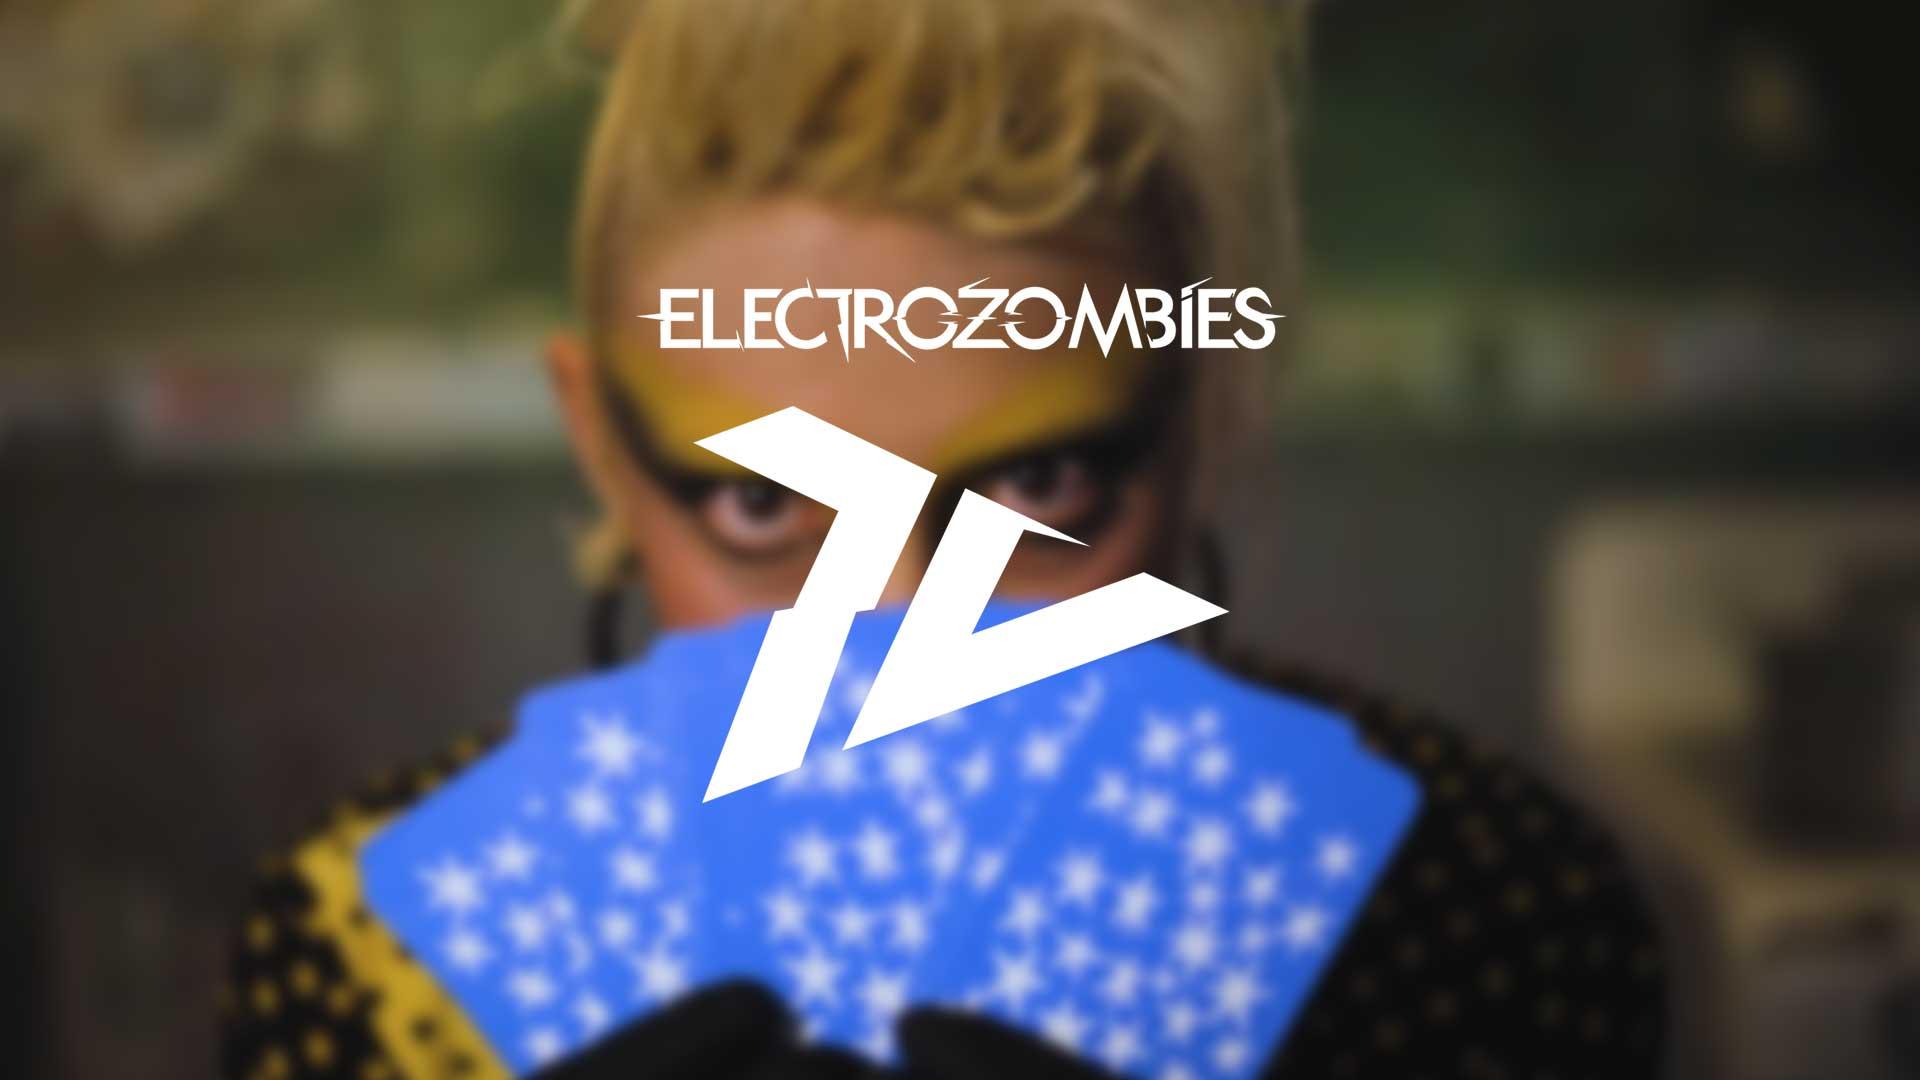 Electrozombies TV 09/2020